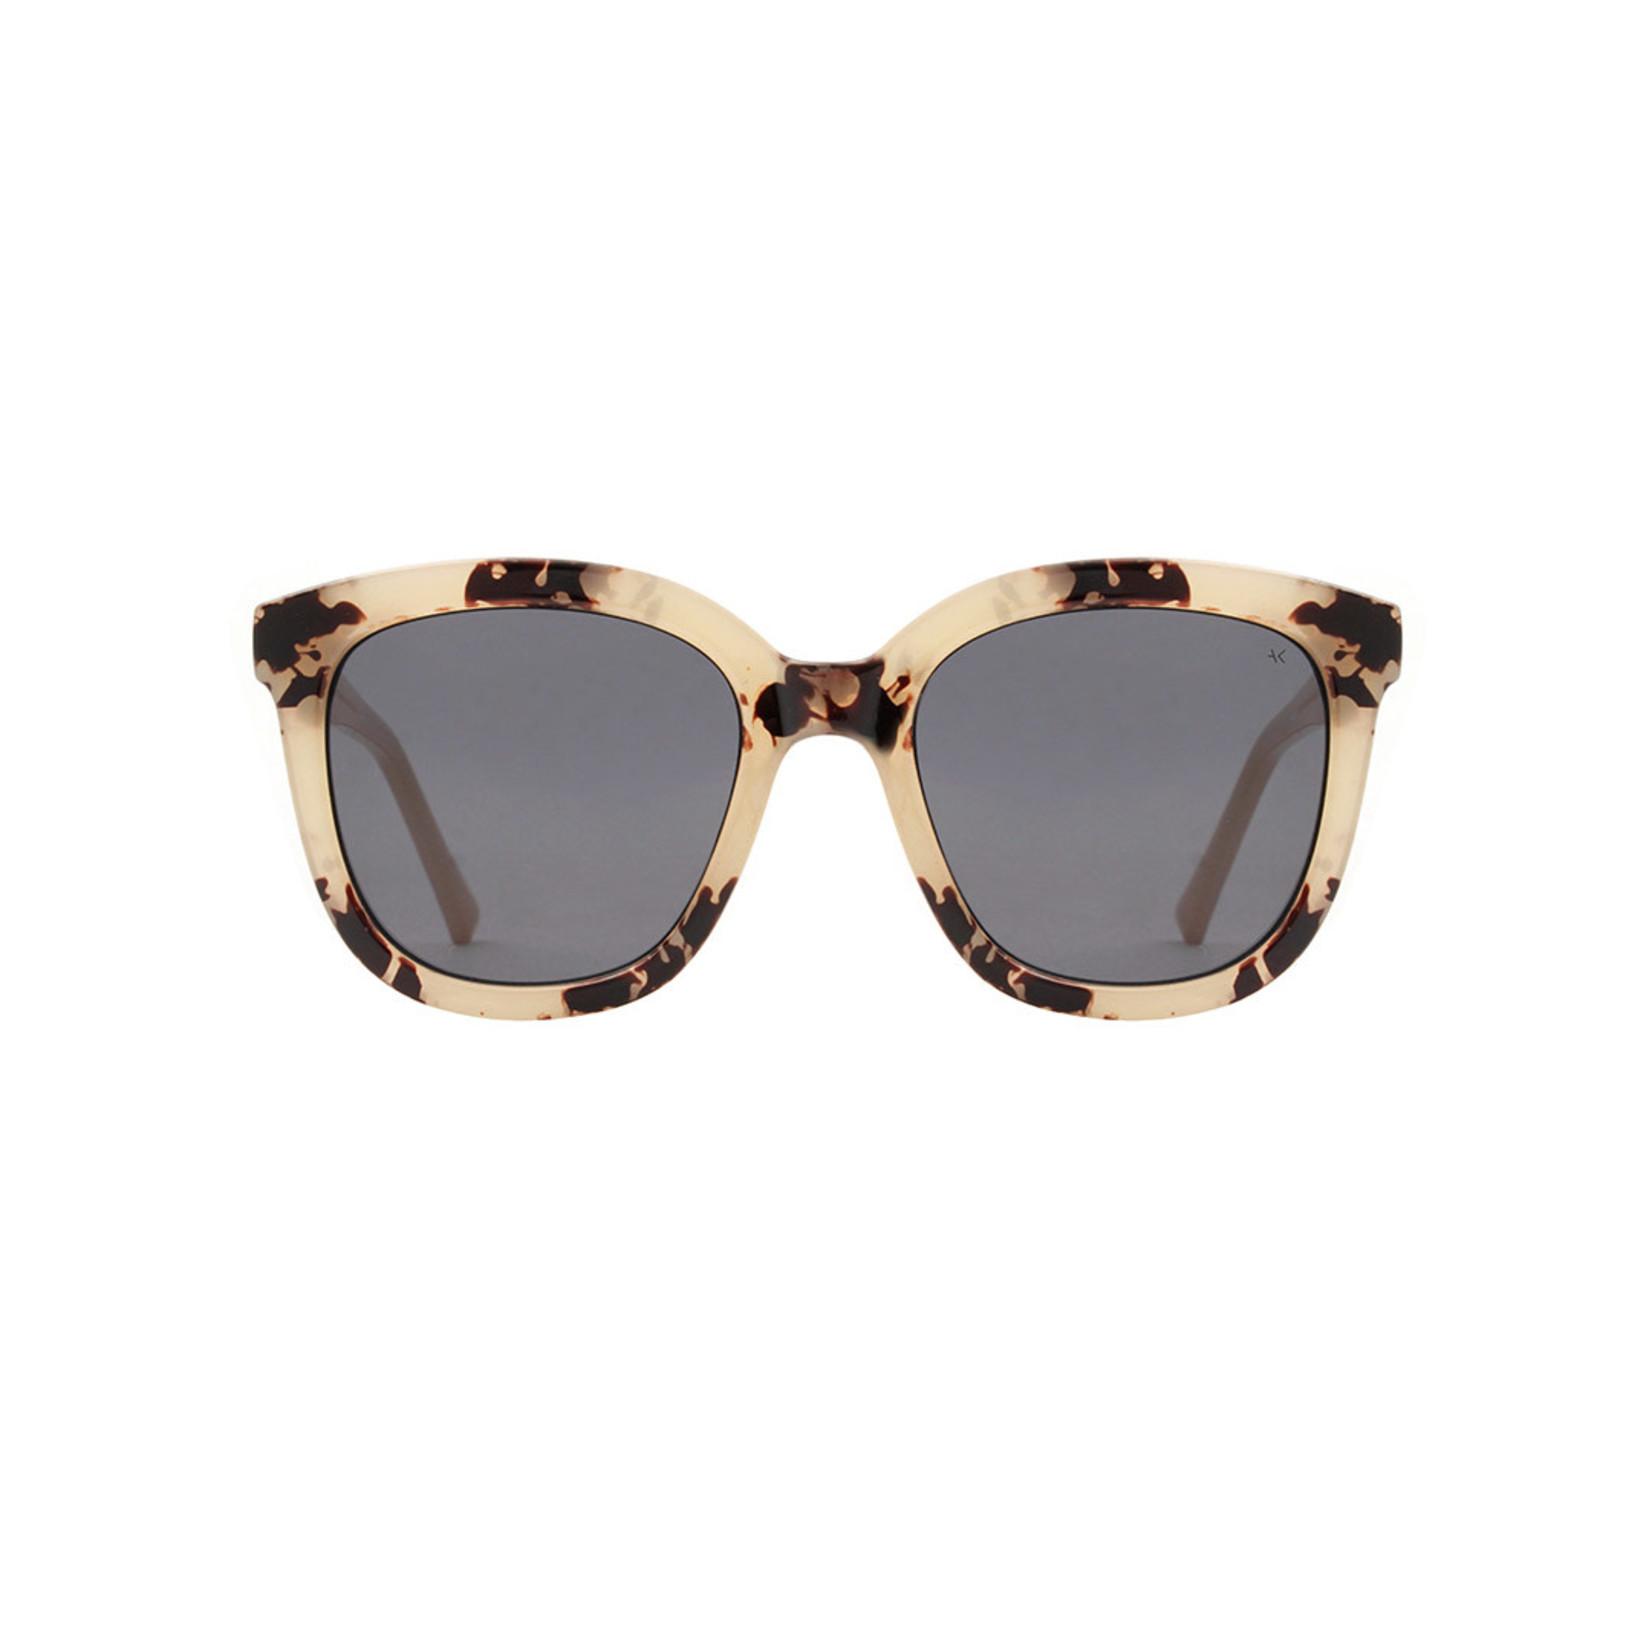 Kjearbede Kjearbede zonnebril Billy Hornet /KL2106-002